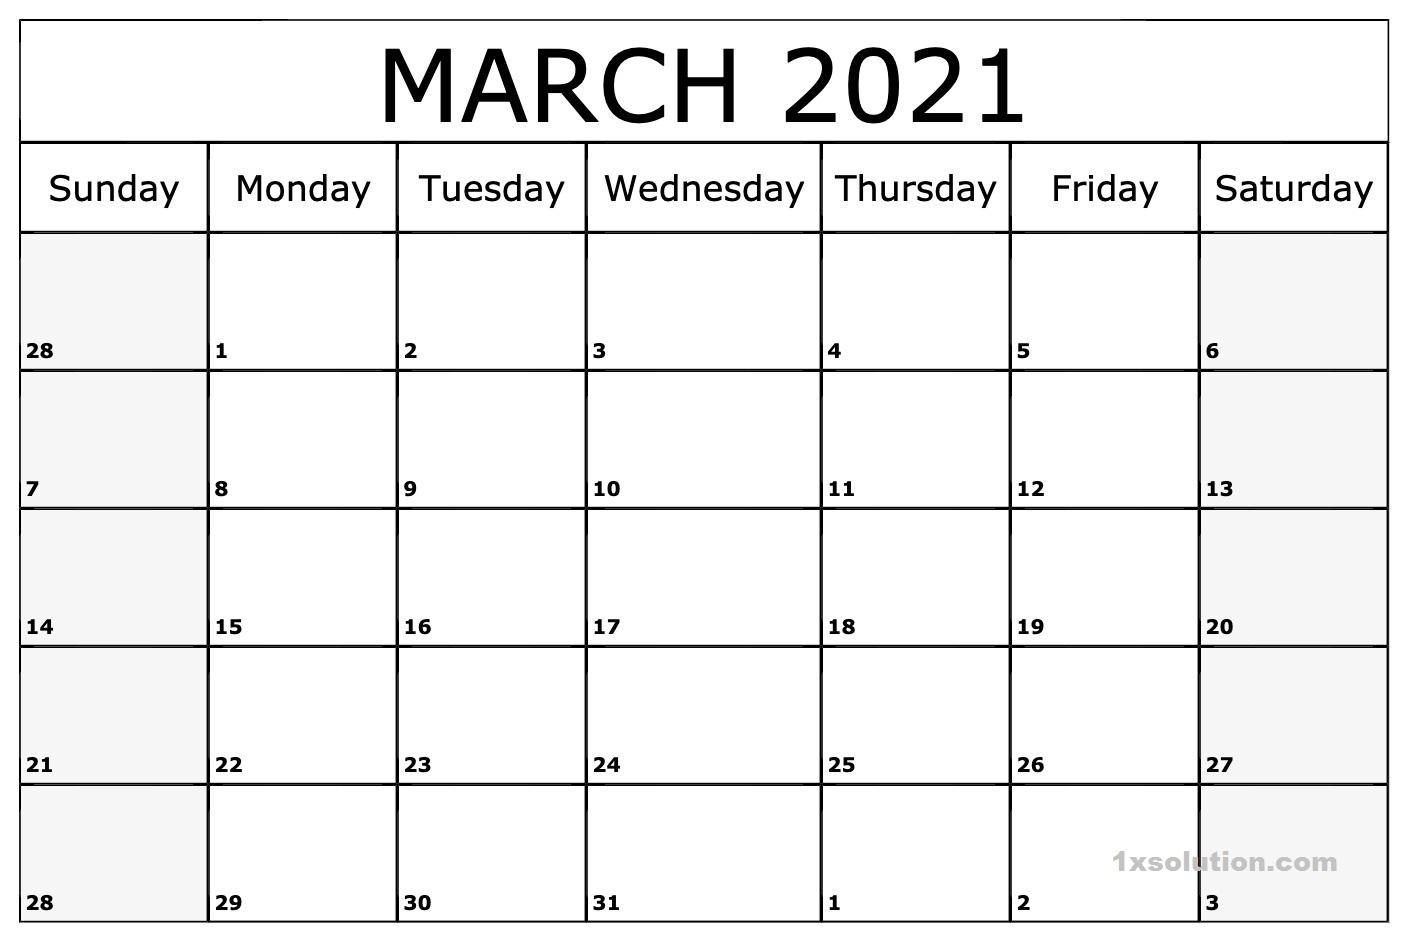 Daily March 2021 Calendar Printable